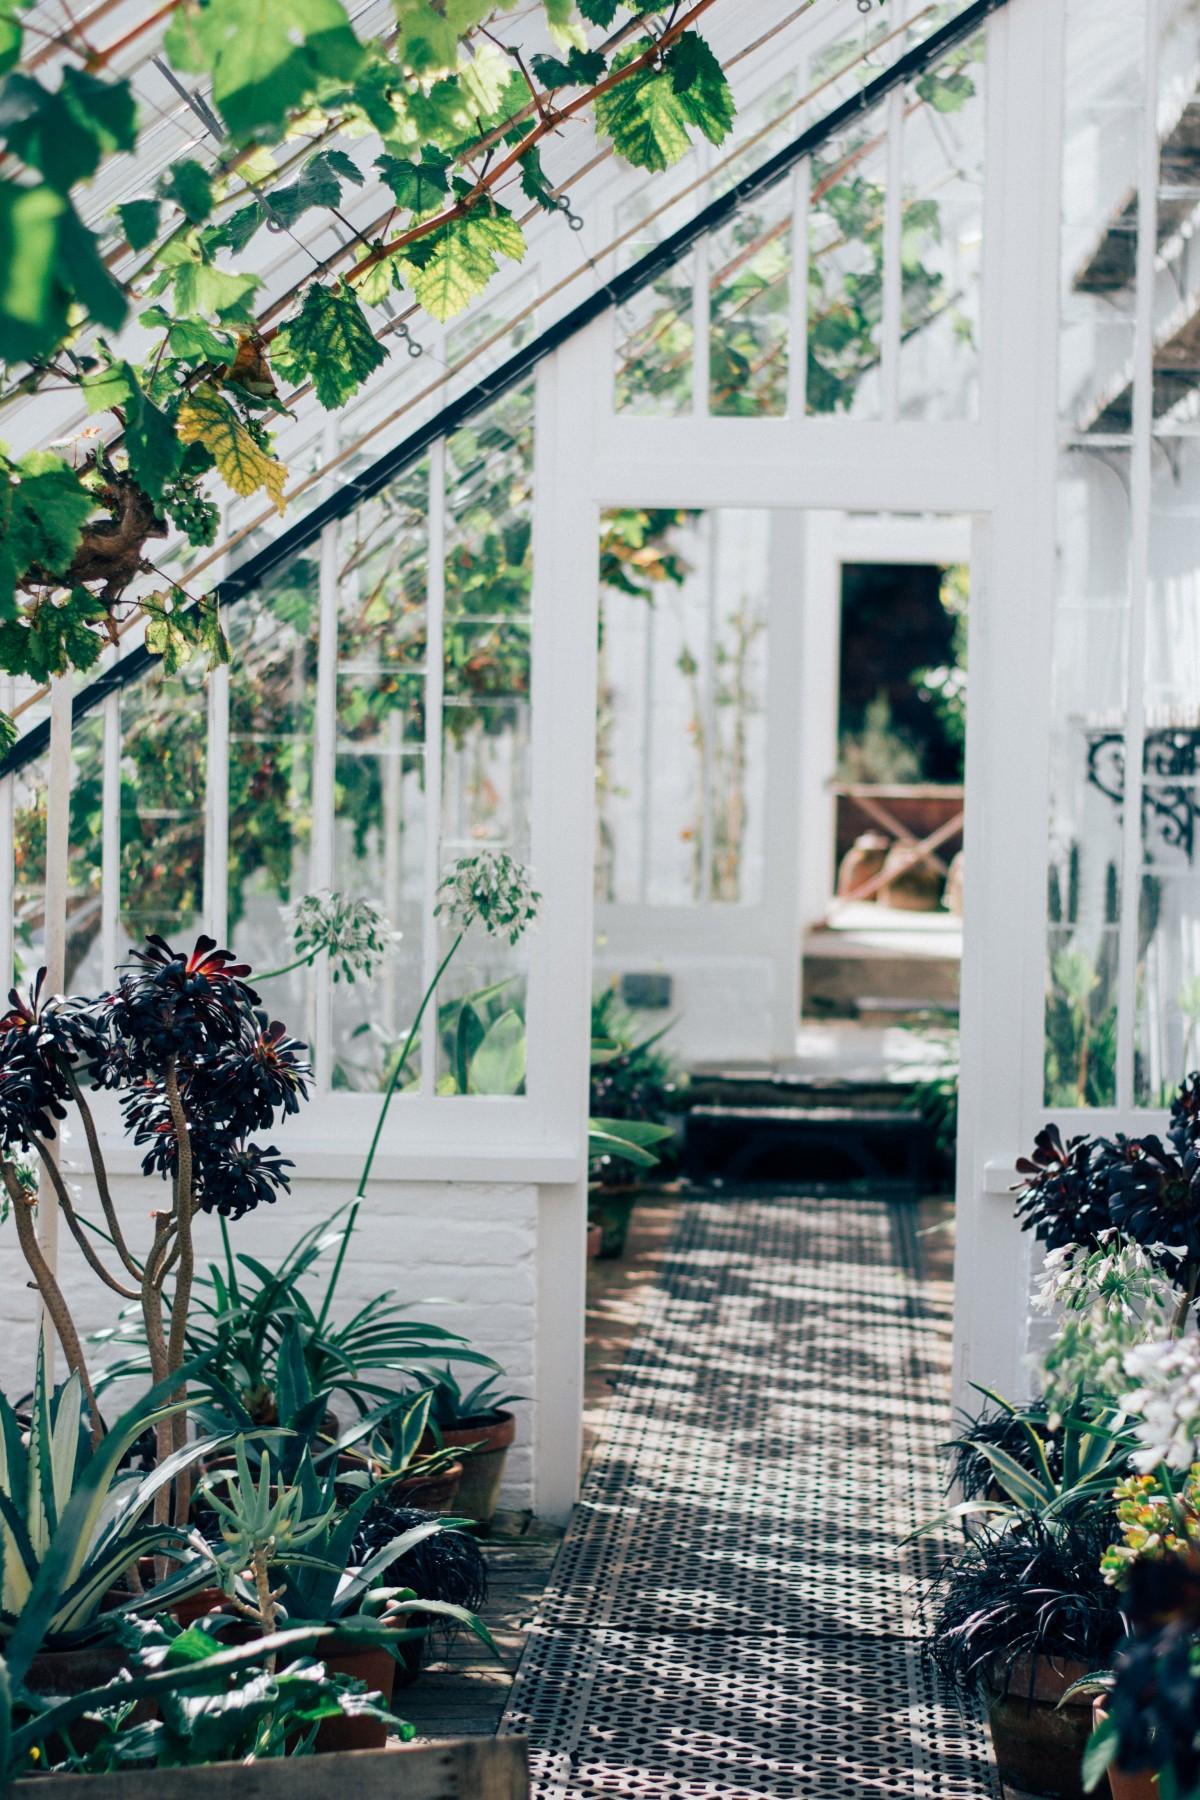 glasshouse_greenhouse_plants_vine_door-19018.jpg